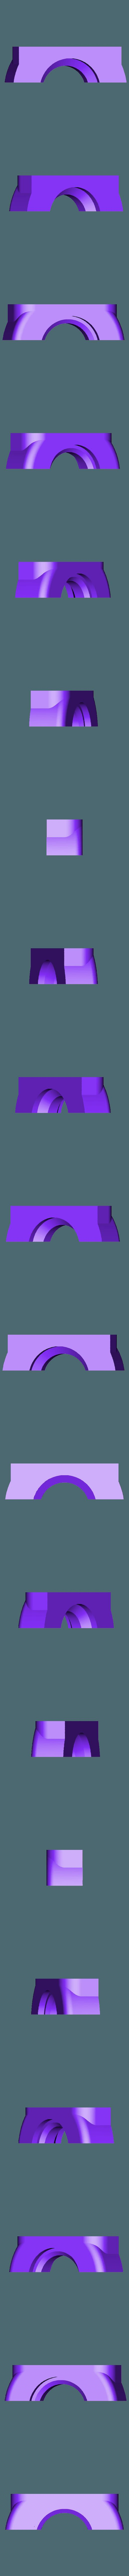 E3D_holder.stl Download free STL file Lukestruder - The E3D V6 bowden mount for prusa i3 (Anet A8) • 3D printer design, lukeskymuh